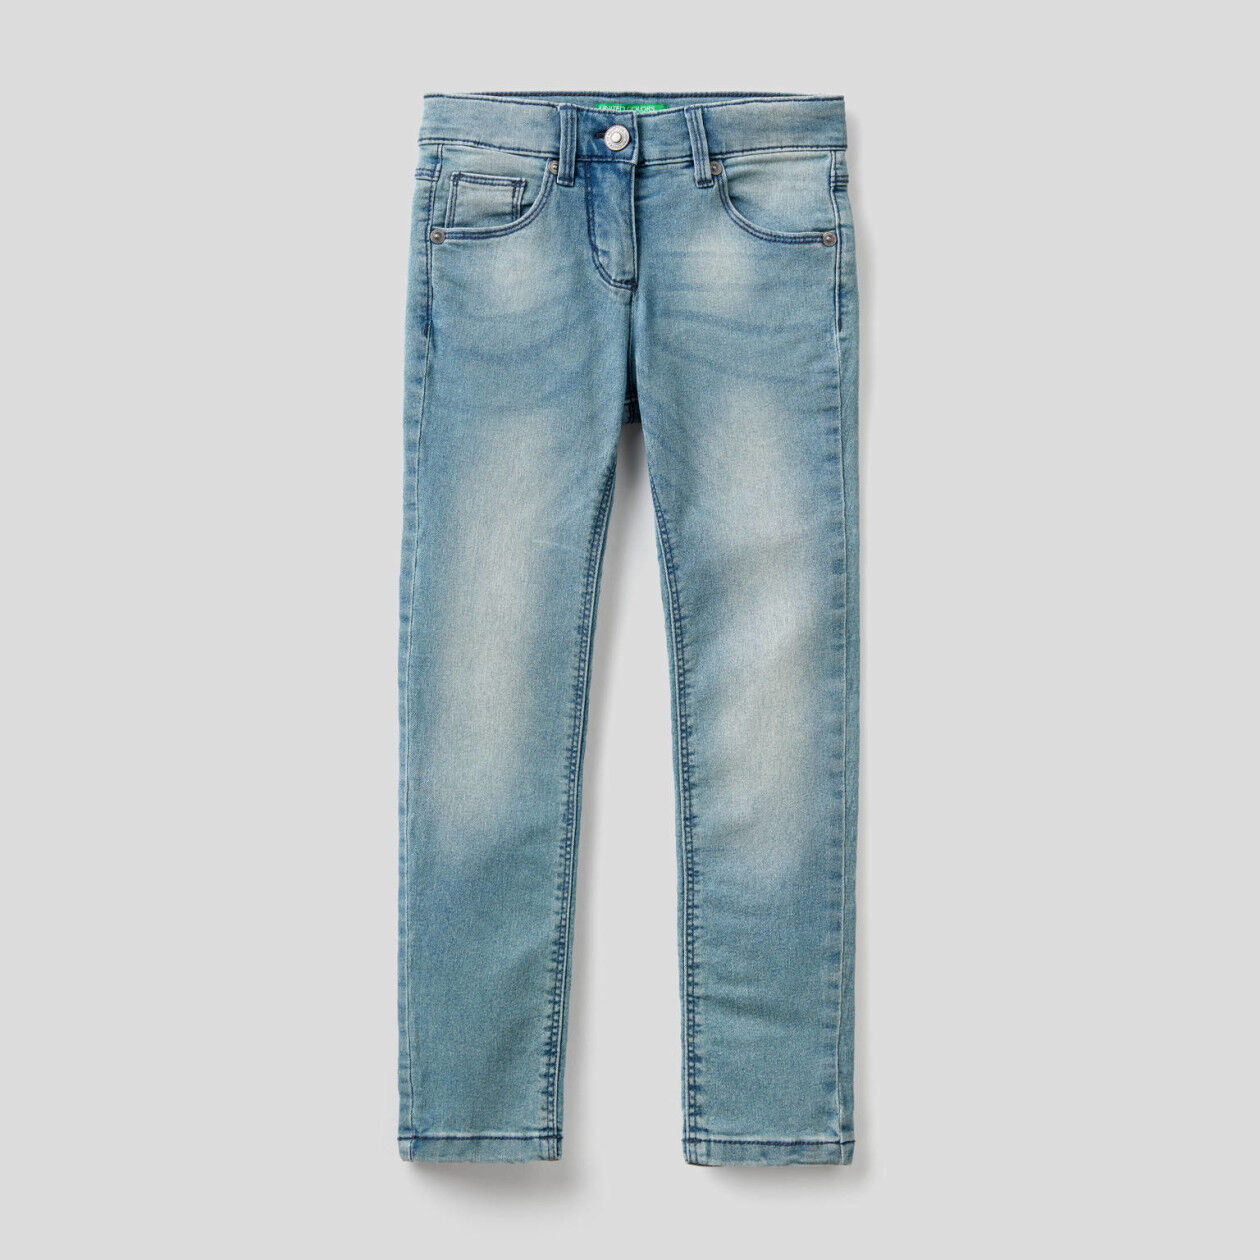 Skinny Fit-Jeans mit niedrigem Bund